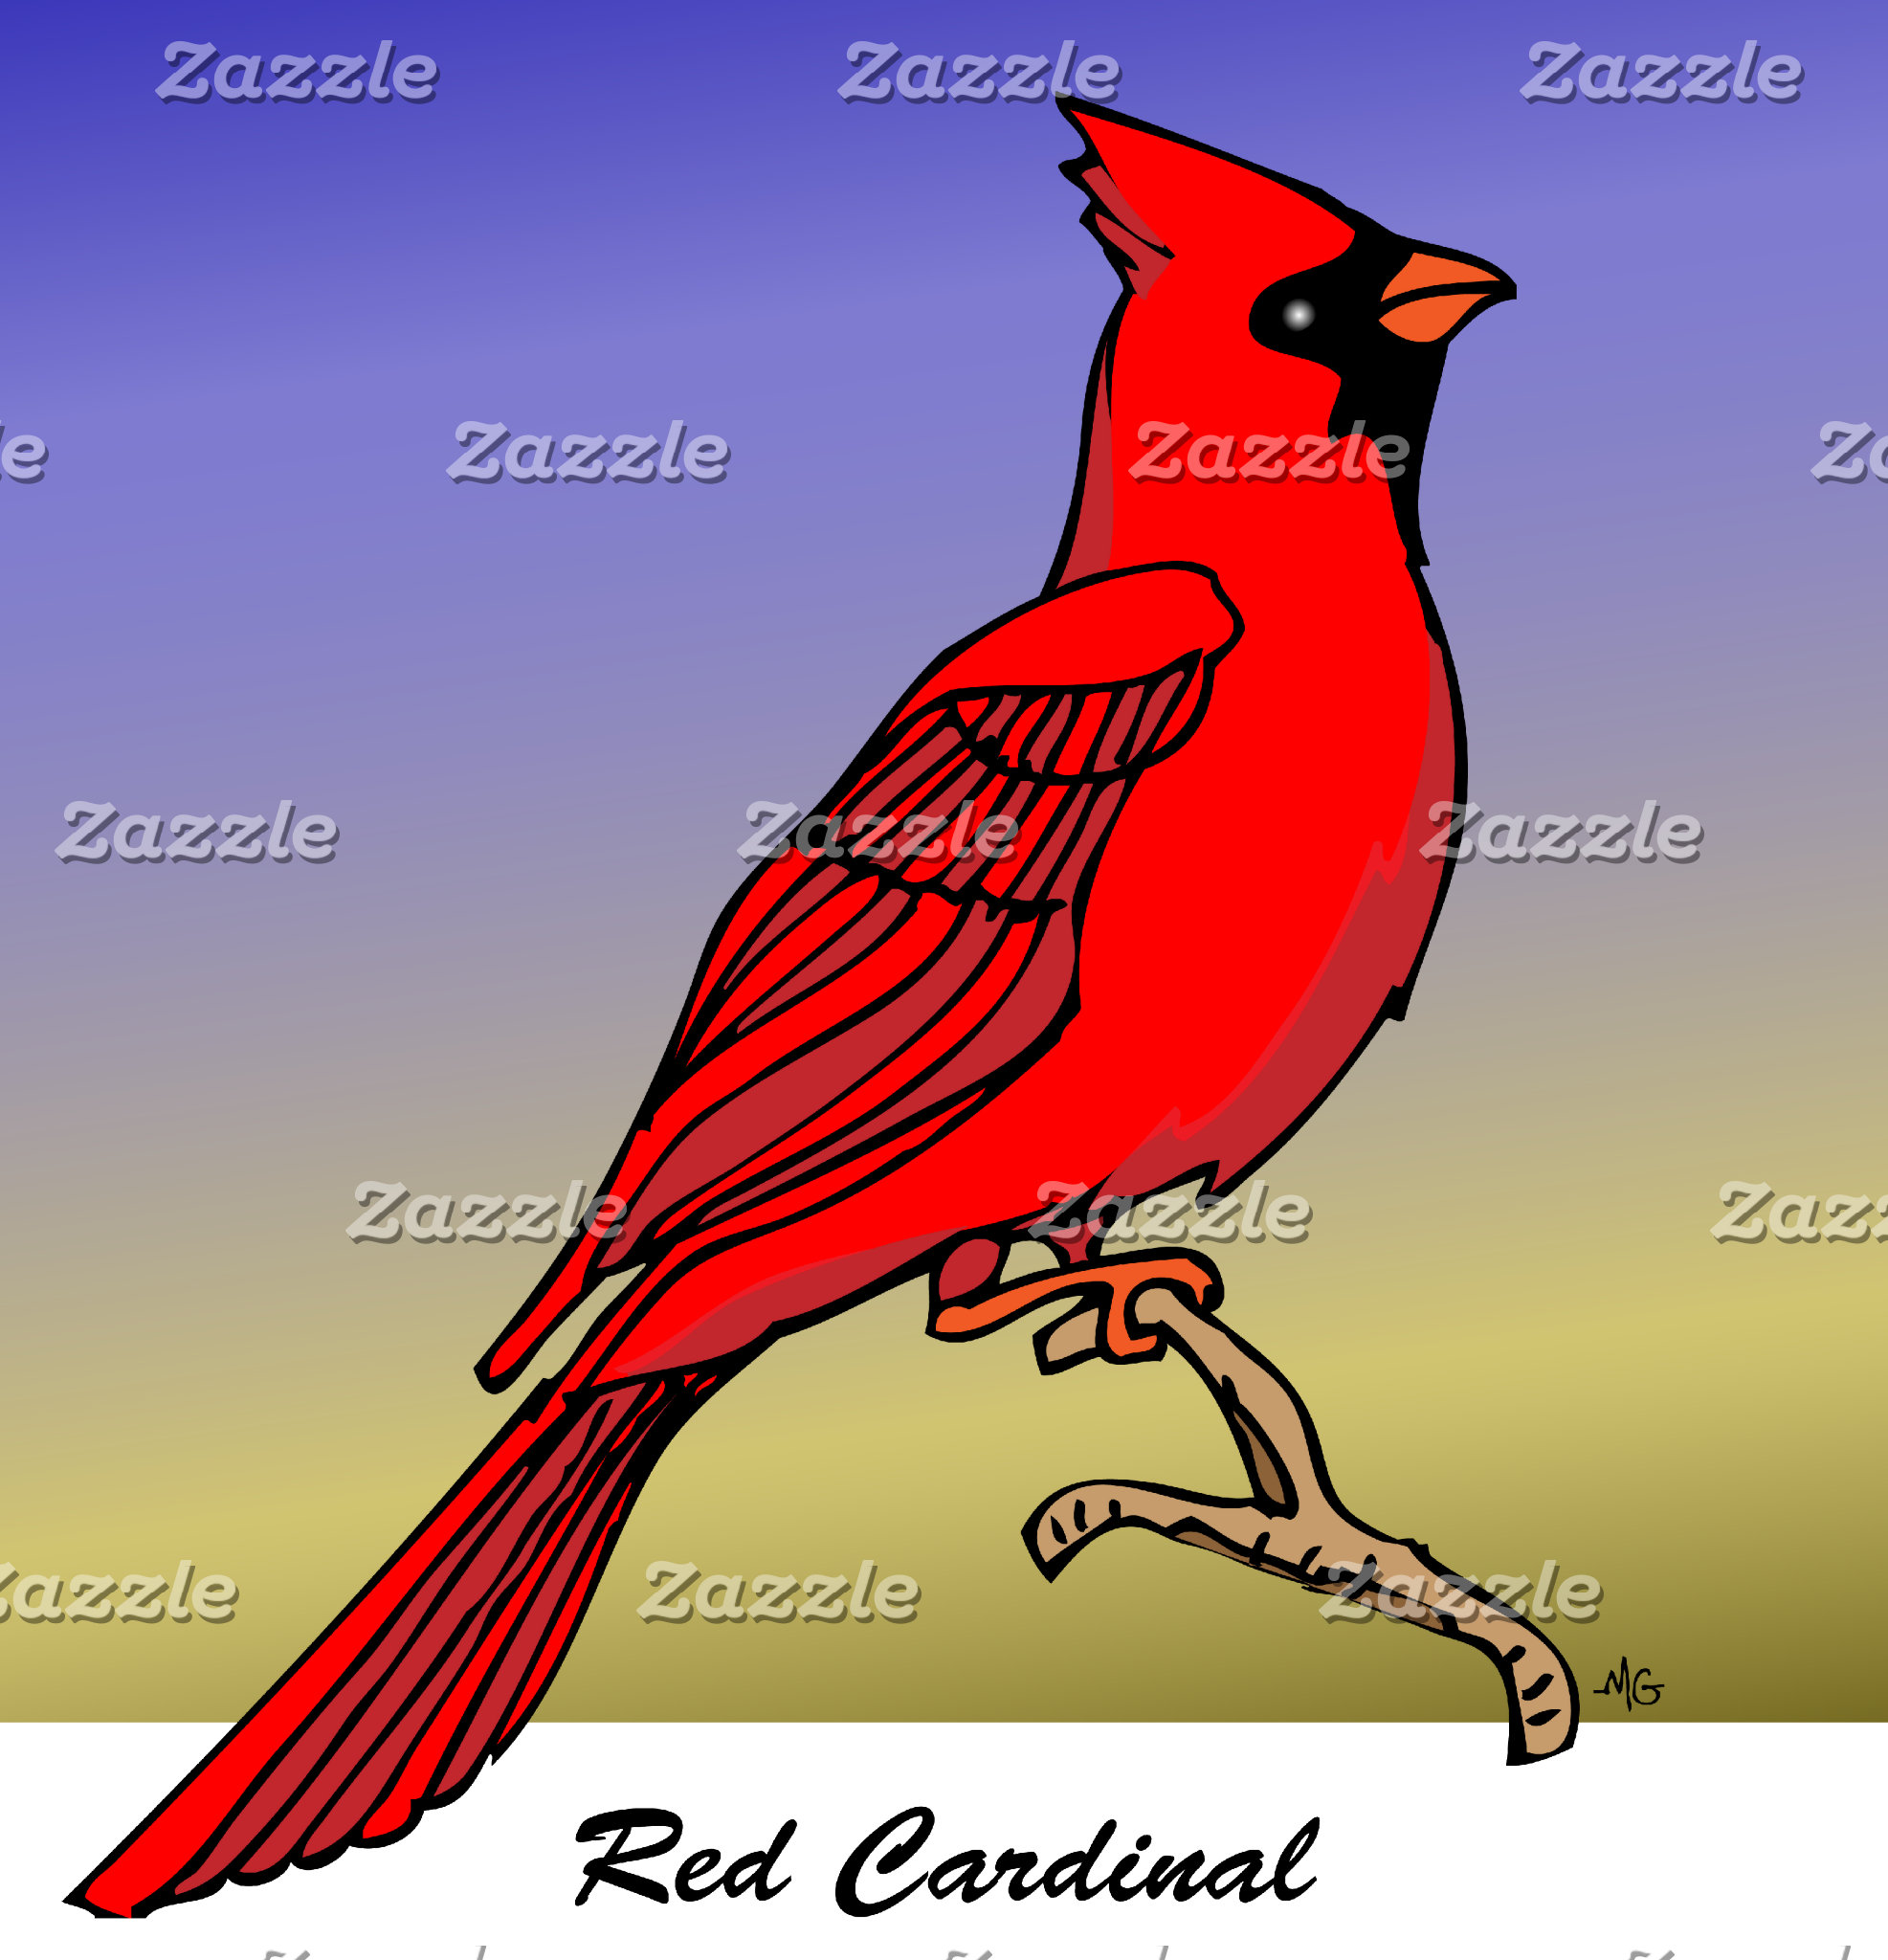 RED CARDINAL rev.2.0